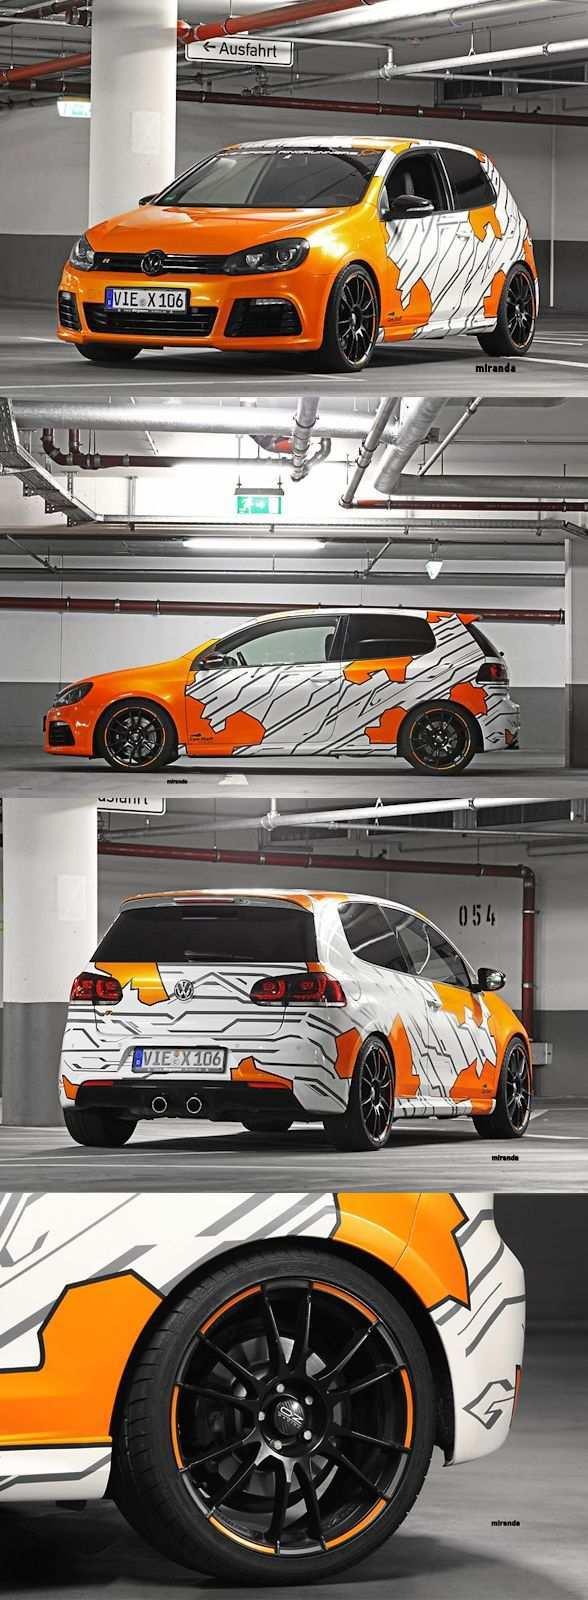 Carwrapping Wrap Vehicle Inspiration Autobeklebung Autofolierung Folie Design Vw Autos Folierung Fahrzeugbeschriftung